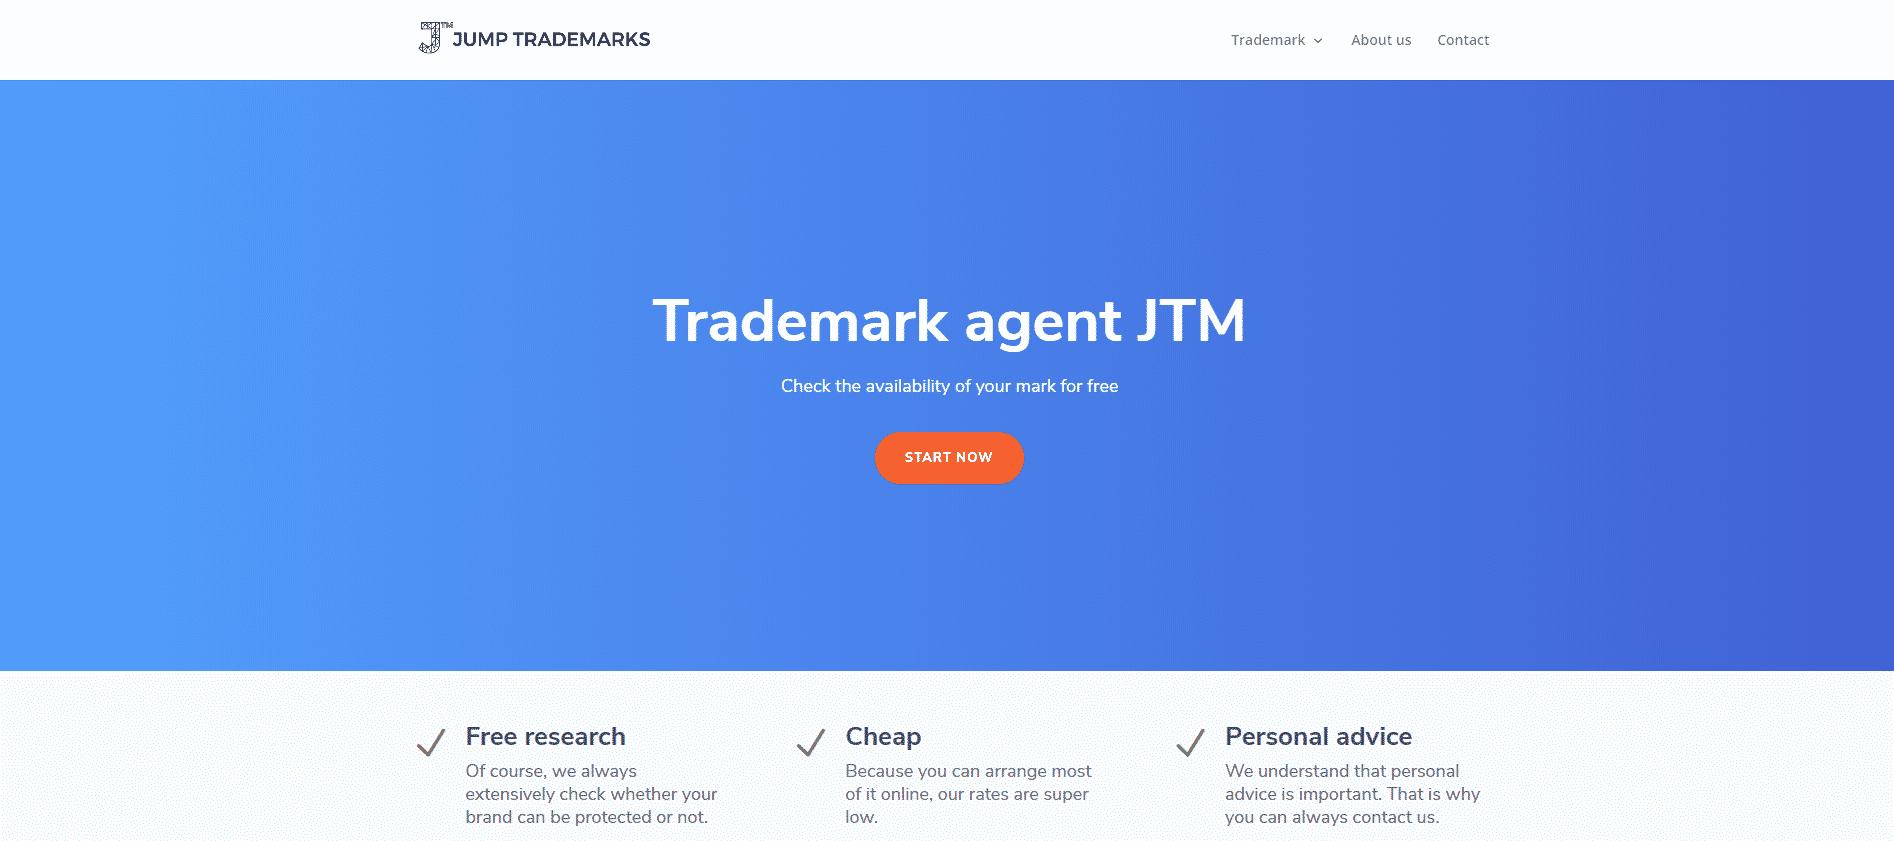 JUMP Trademarks